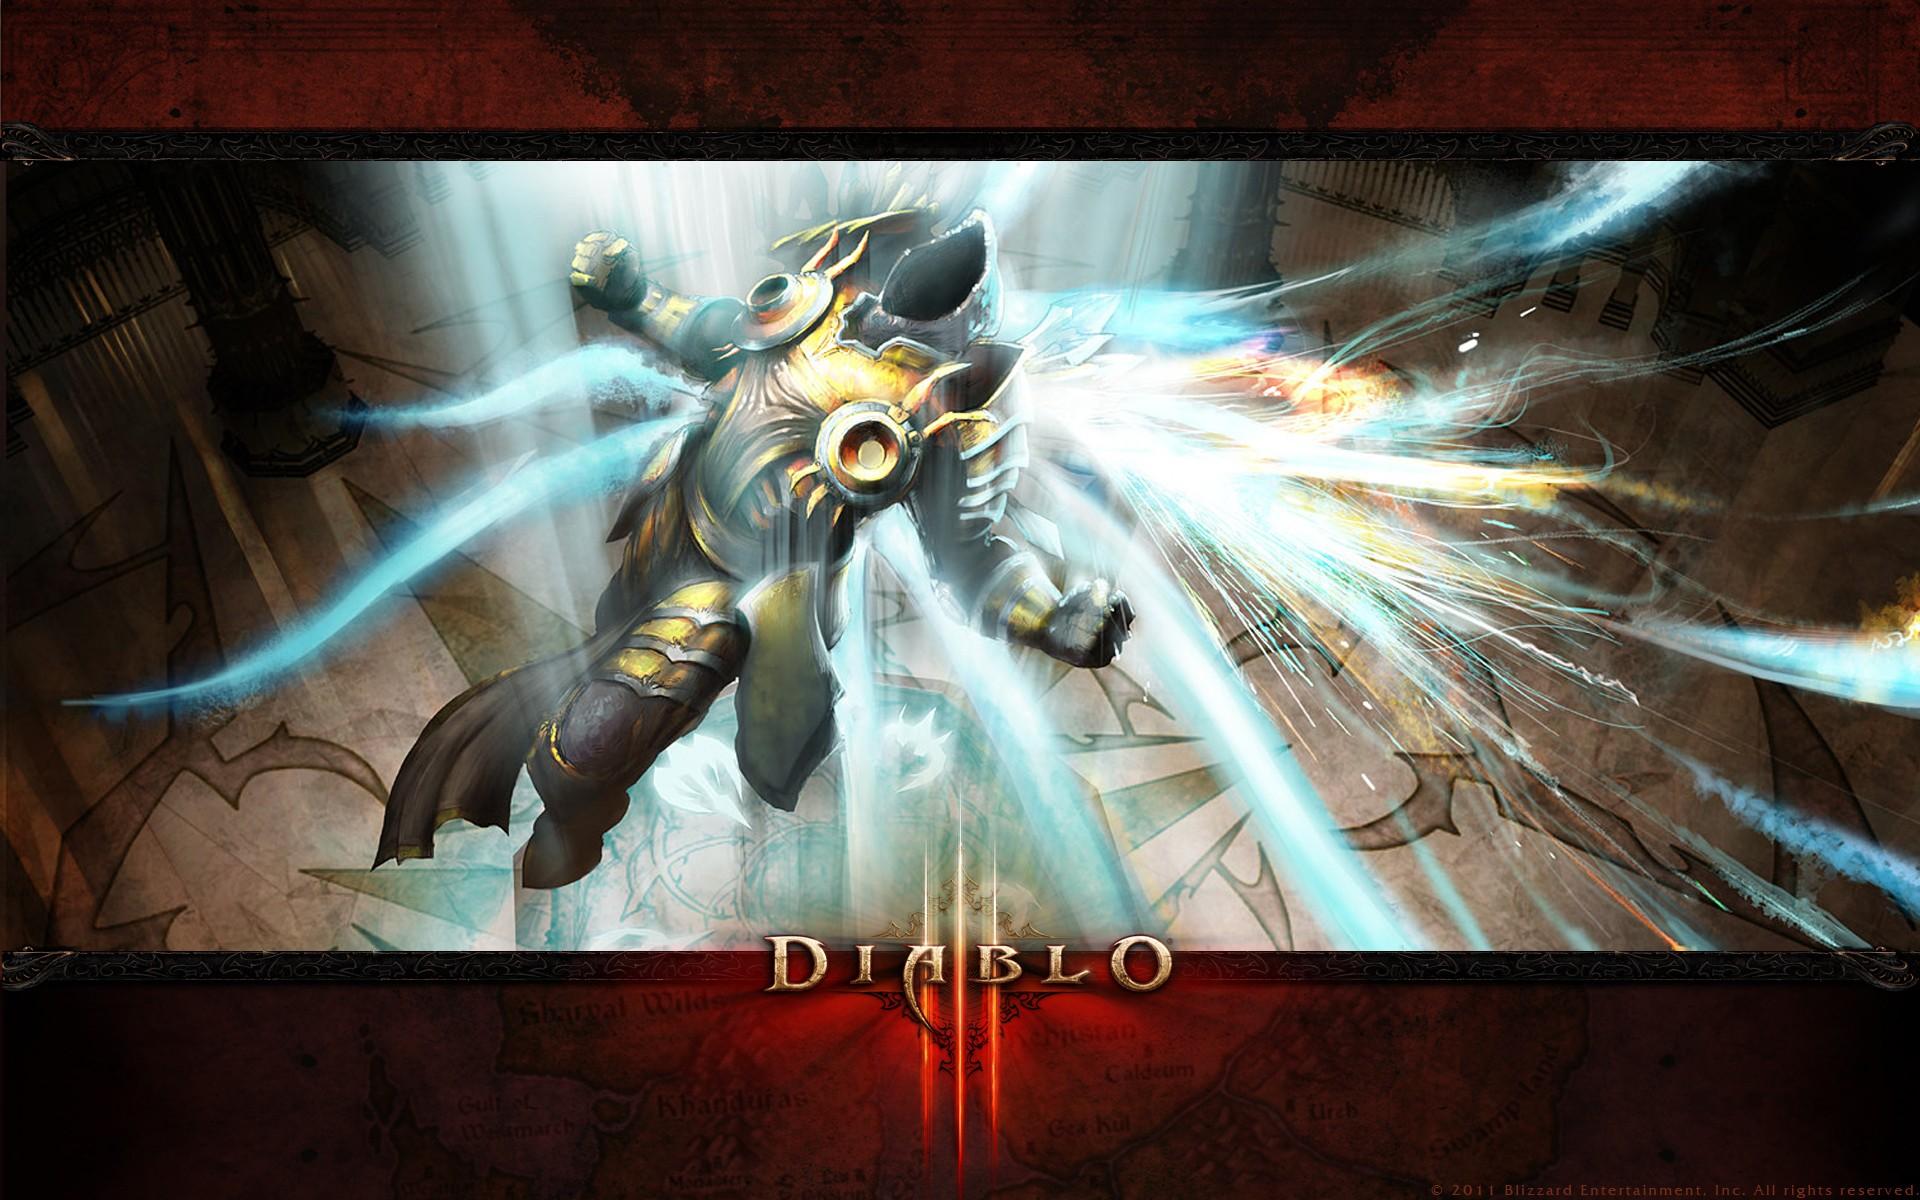 Blizzard Entertainment Wallpaper 1920x1200 Blizzard Entertainment 1920x1200